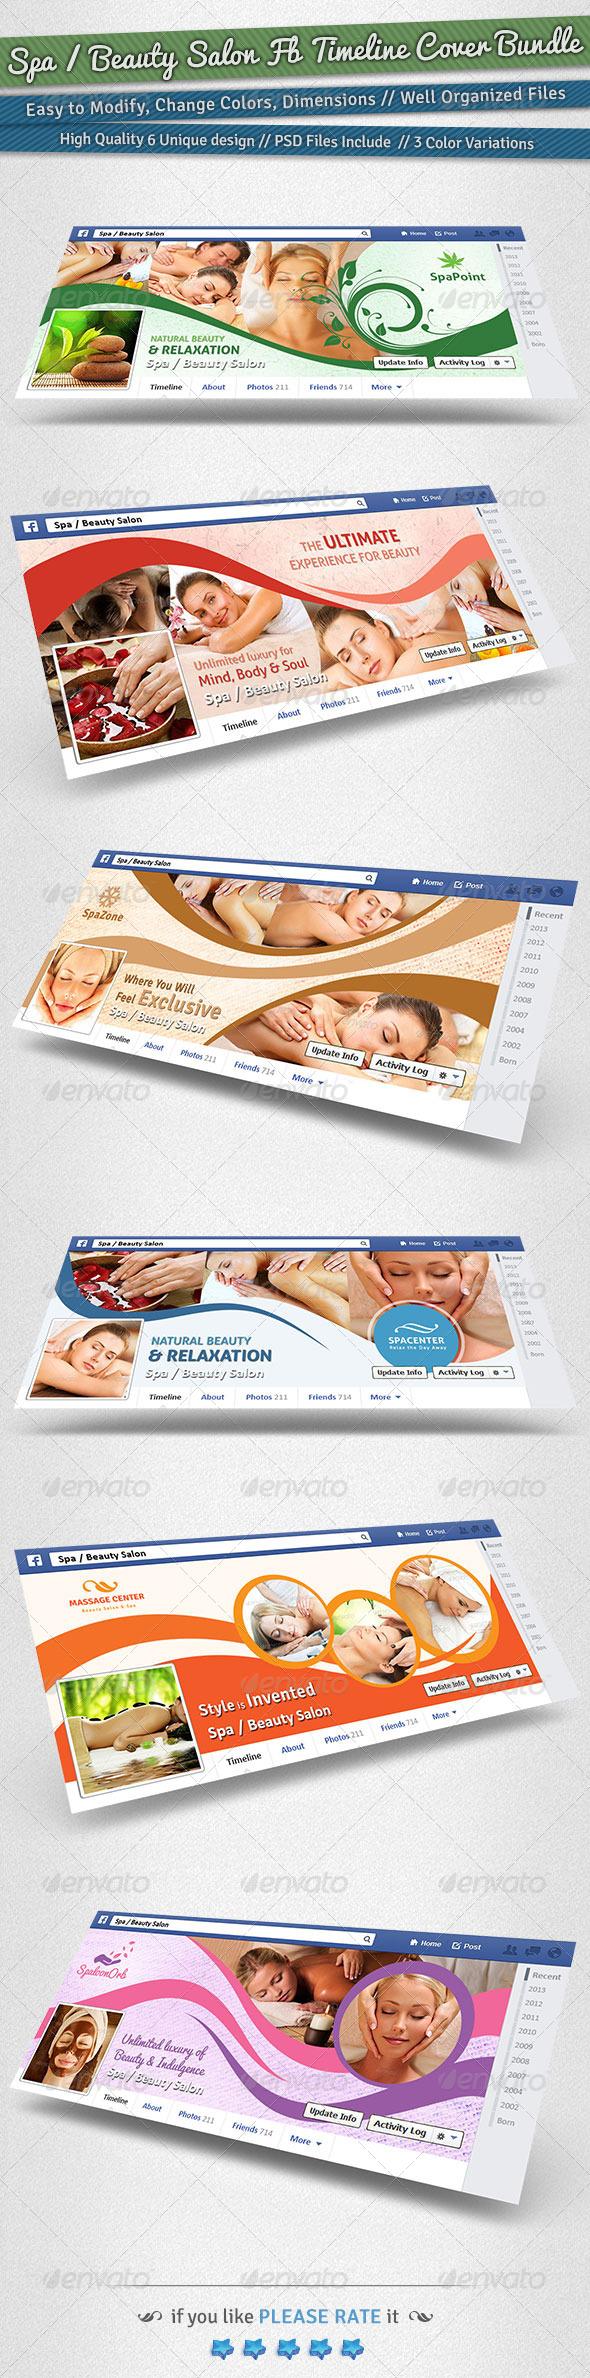 GraphicRiver Spa Beauty Salon Facebook Timeline Cover Bundle 6251357